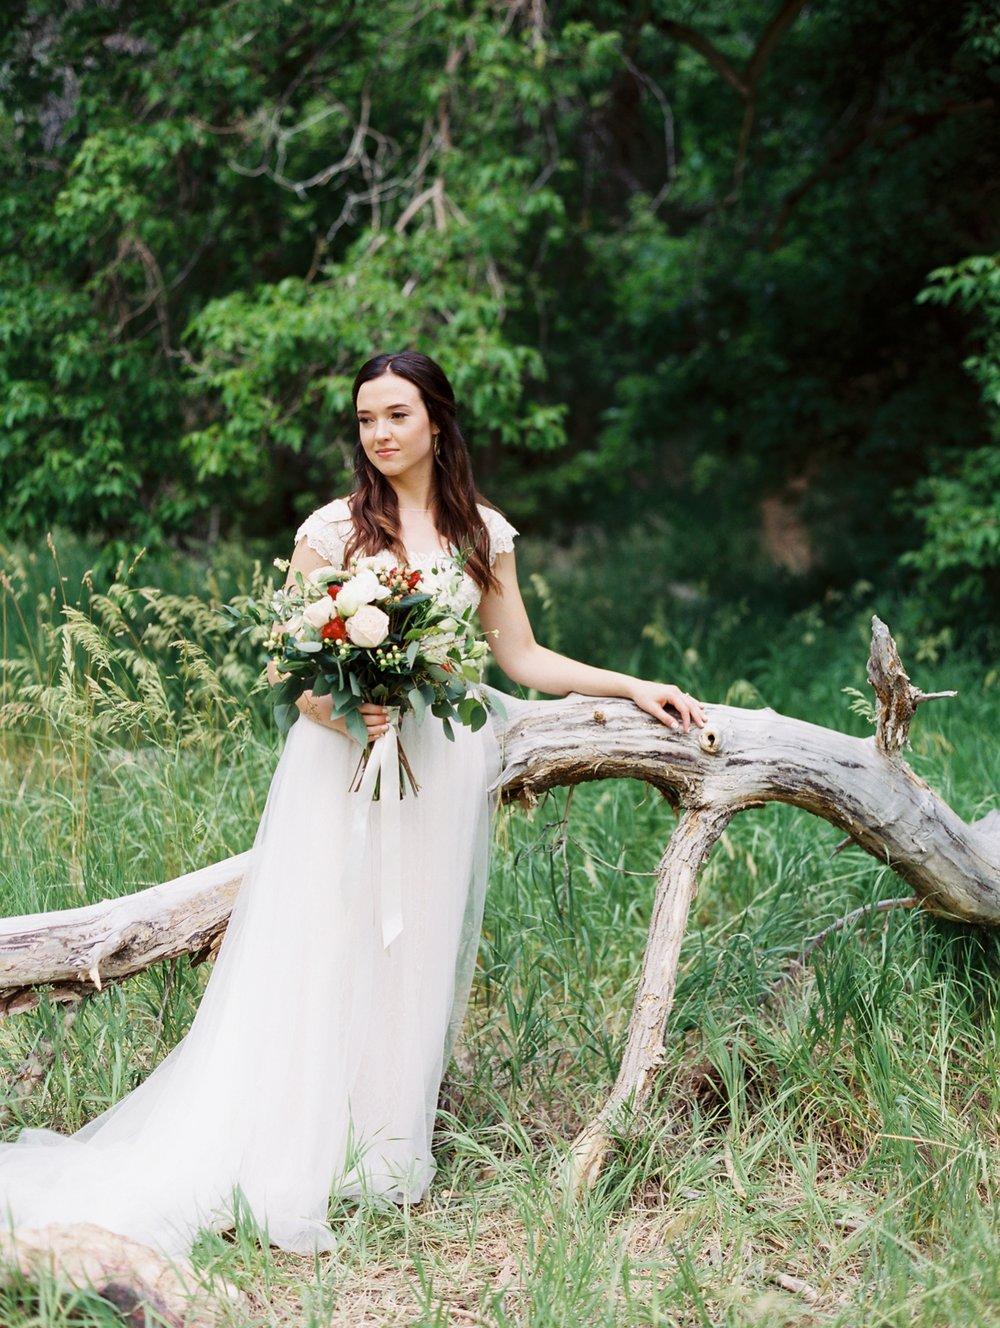 utah-bridal-mountain-portraits-0021.jpg